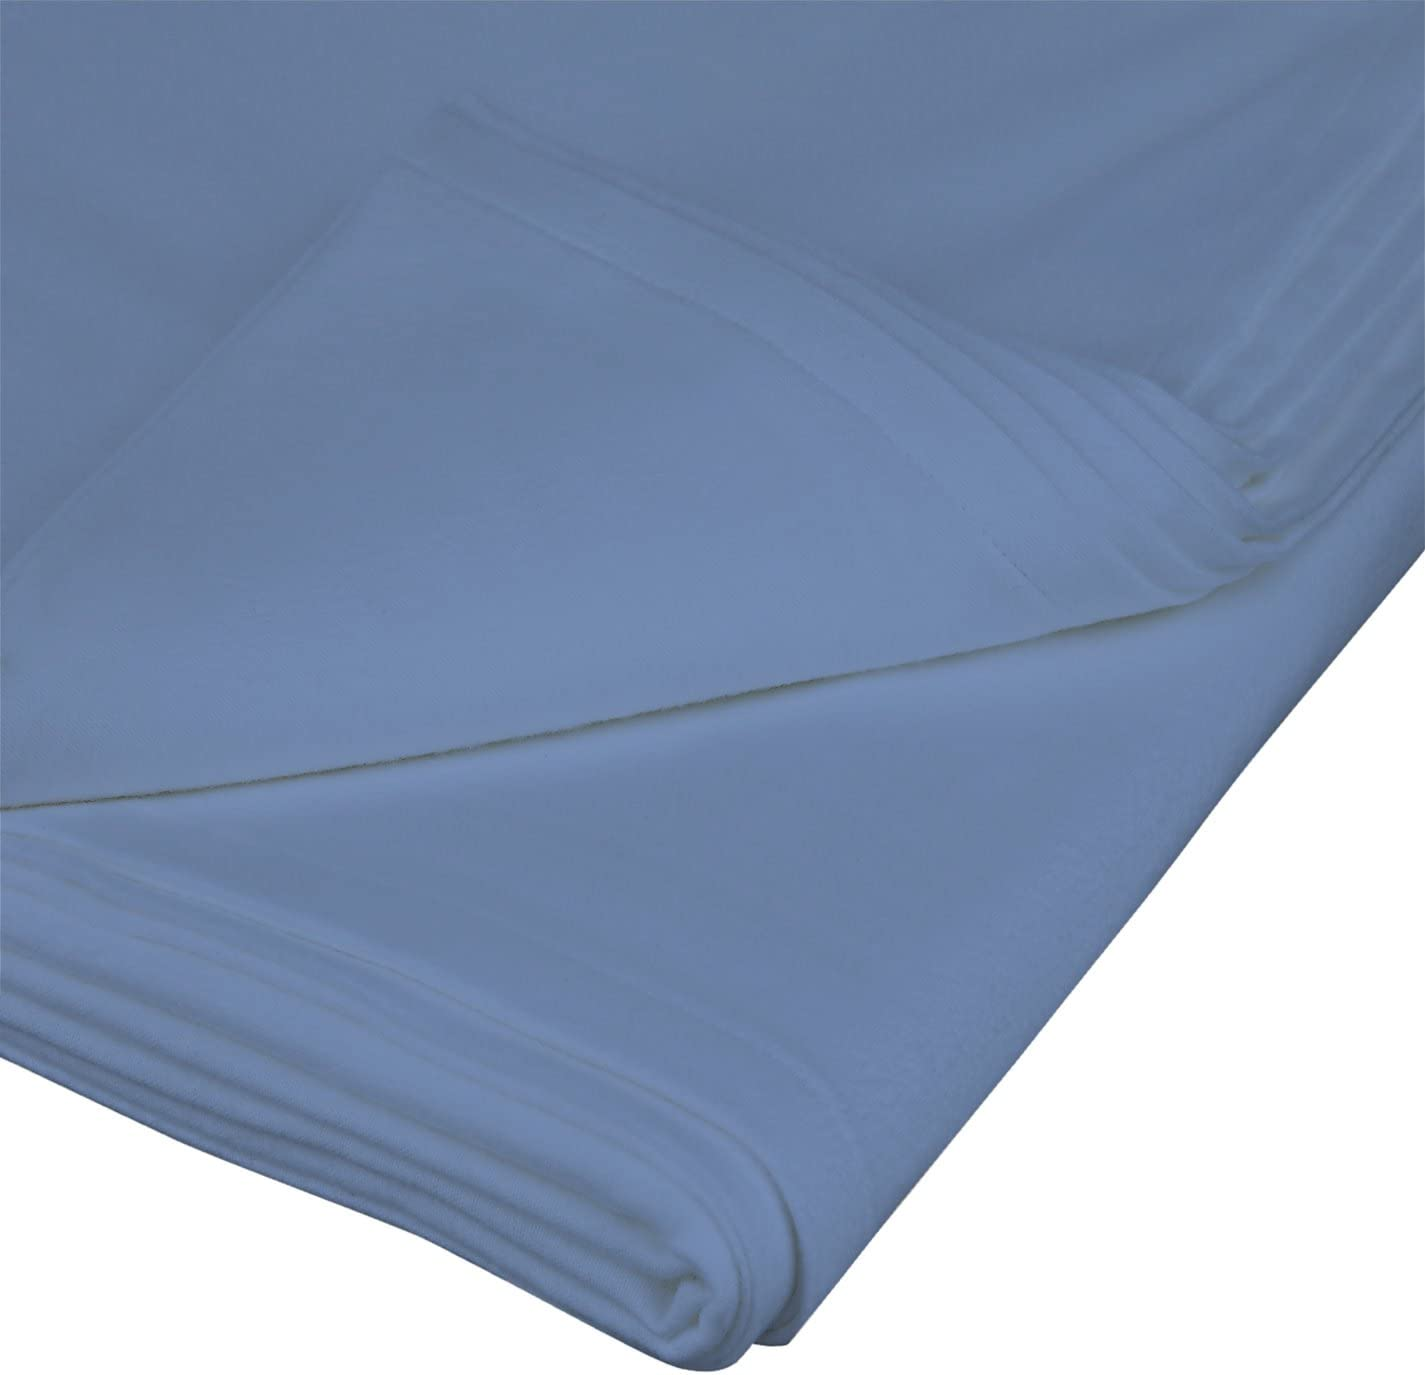 Queen//Full, Dark Grey 1 Duvet Cover, 2 Pillow Cases Serene Linens 600 Thread Count 100/% Long Staple Cotton 3 Pc Duvet Cover Set Breathable Soft Cozy